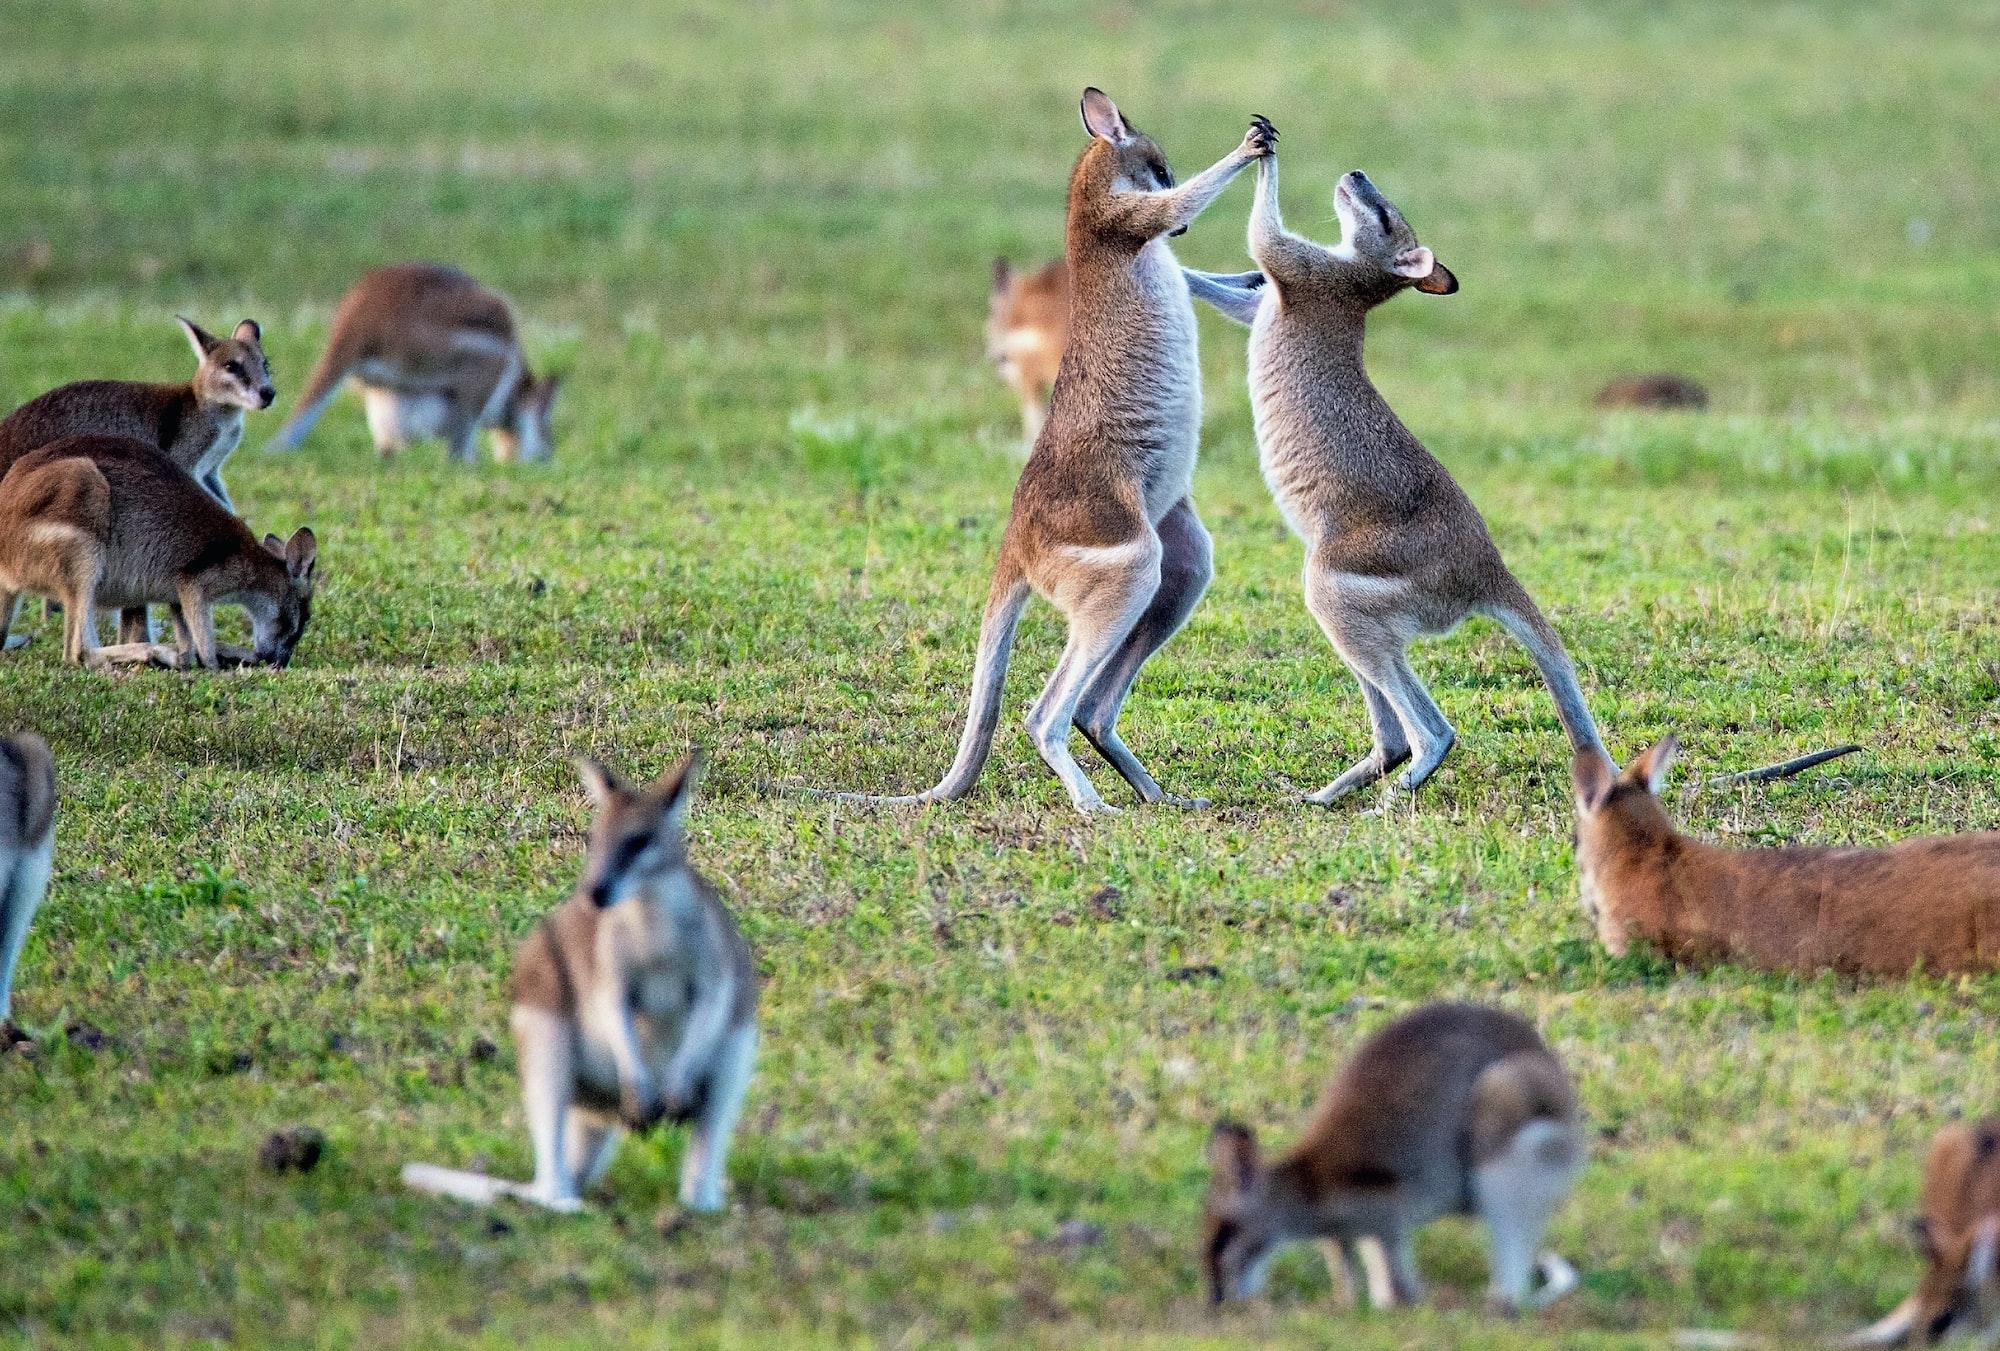 Cheering Team Australia